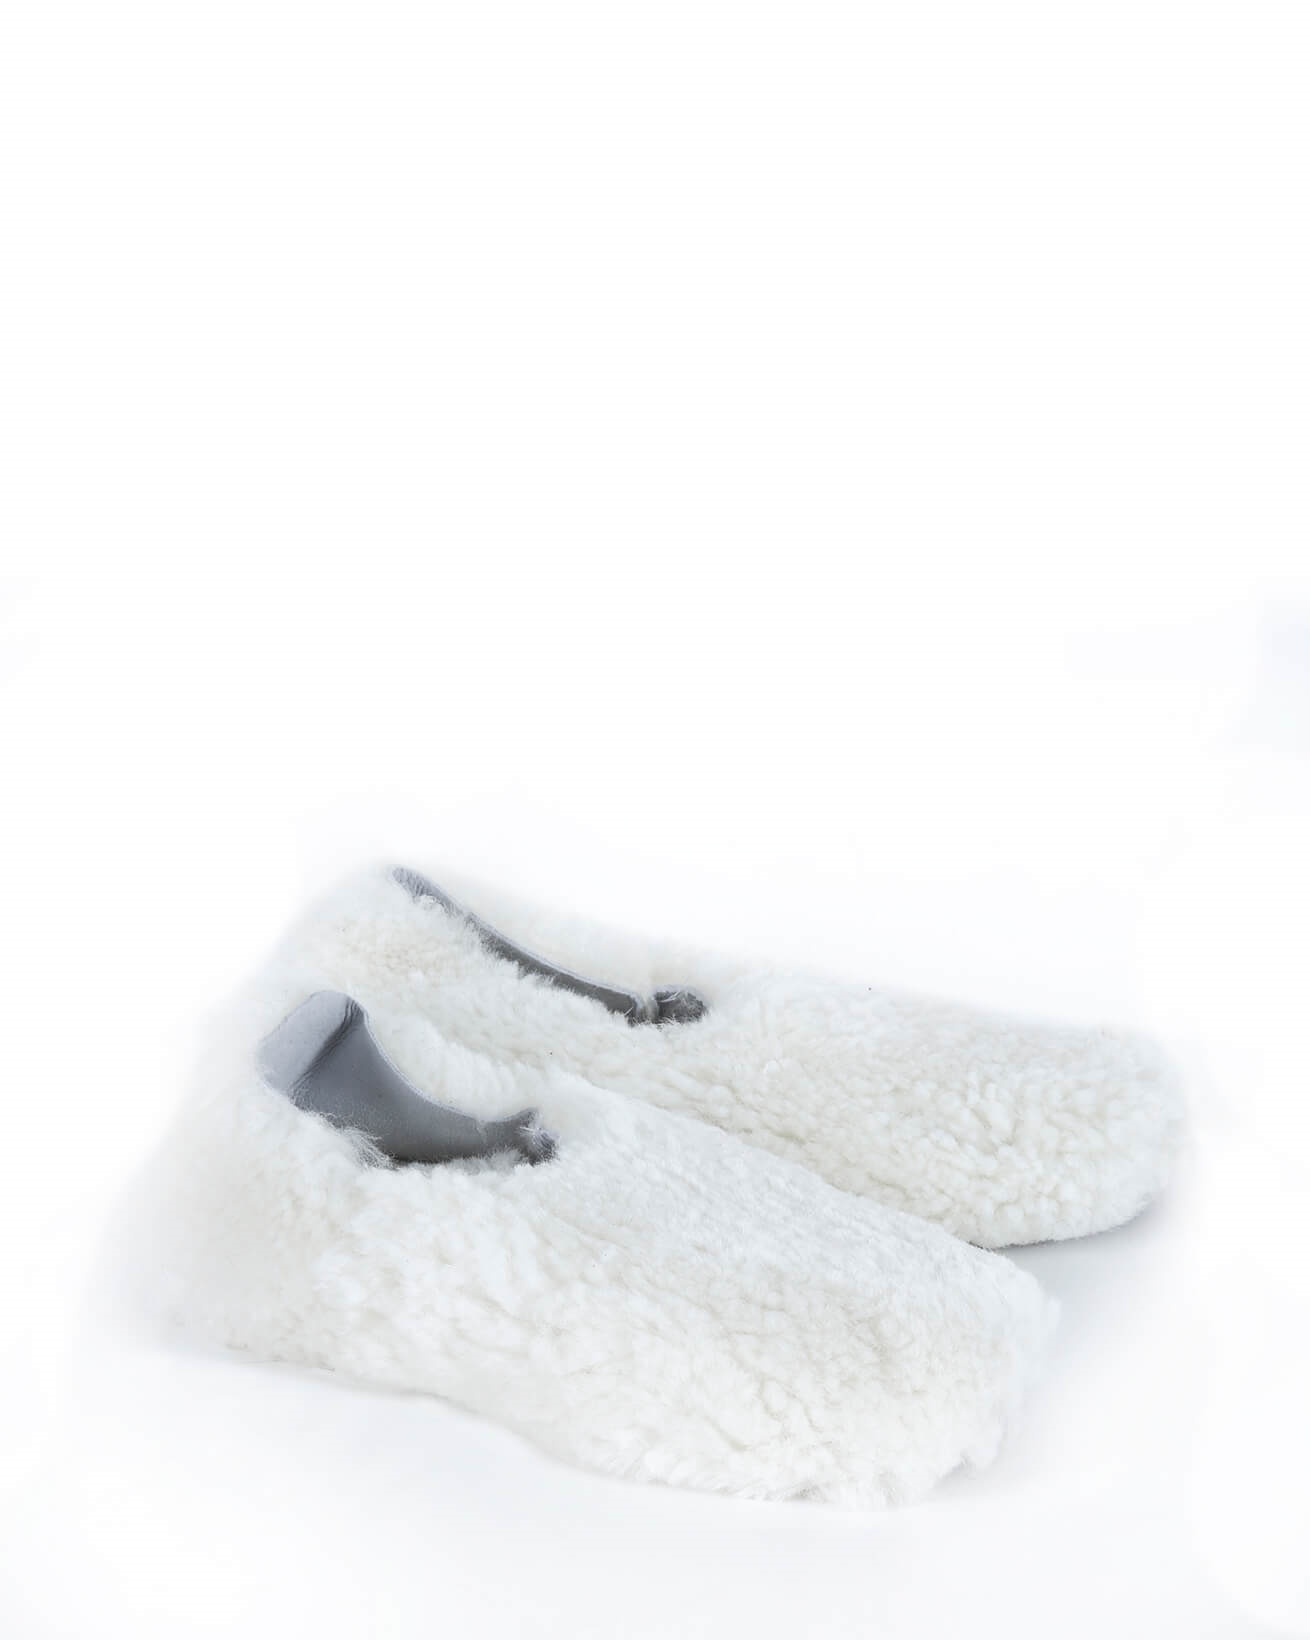 Cocoon Slipper - Size 2 - Winter White - 1174